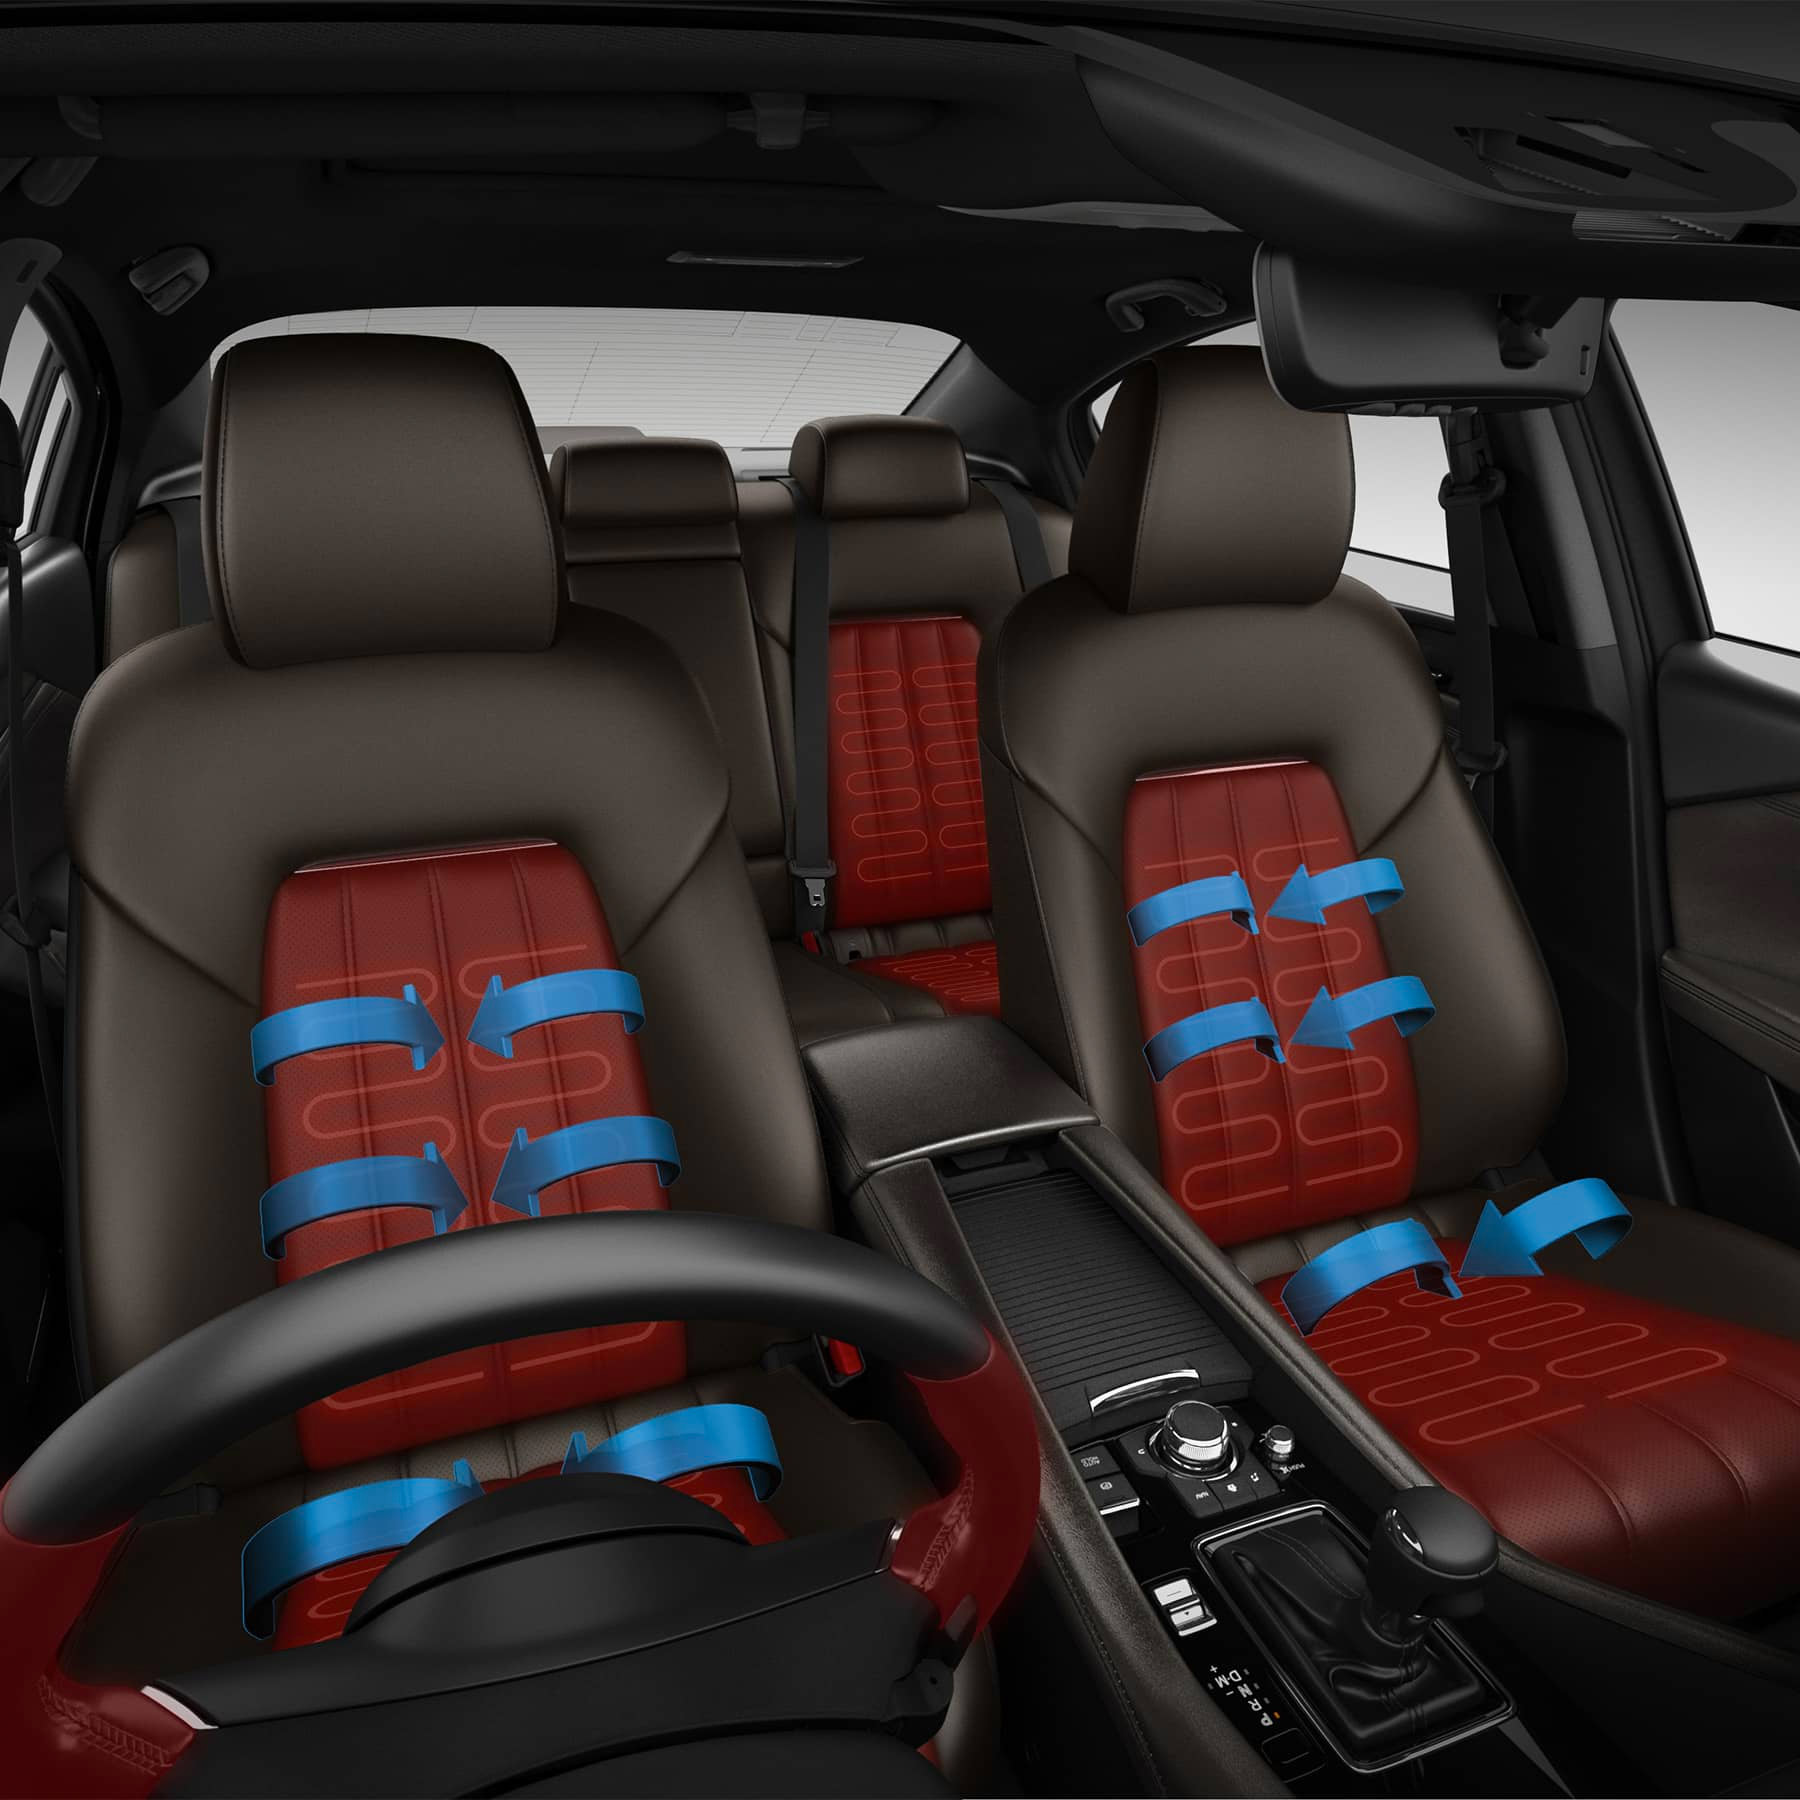 Heated and Ventilated Seats, Heated Steering Wheel